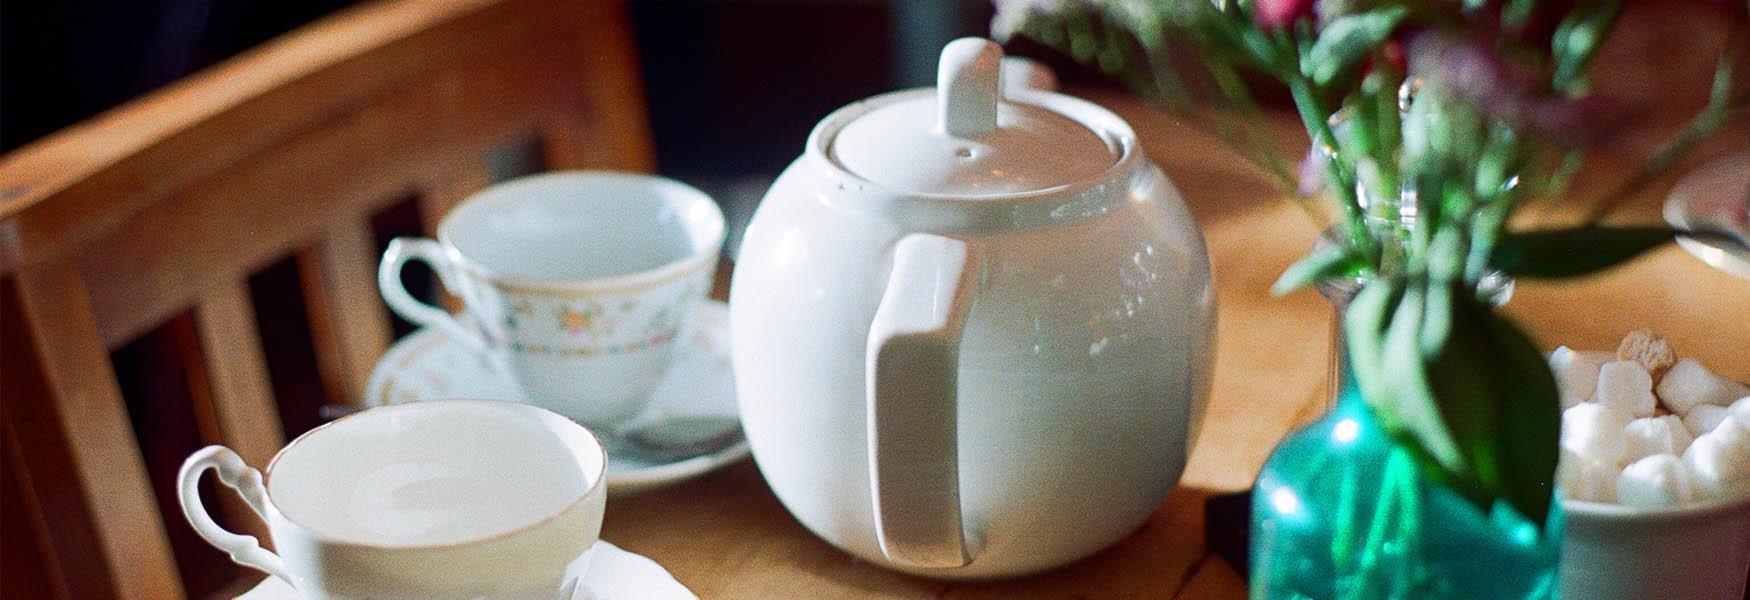 tea room bedfordshire